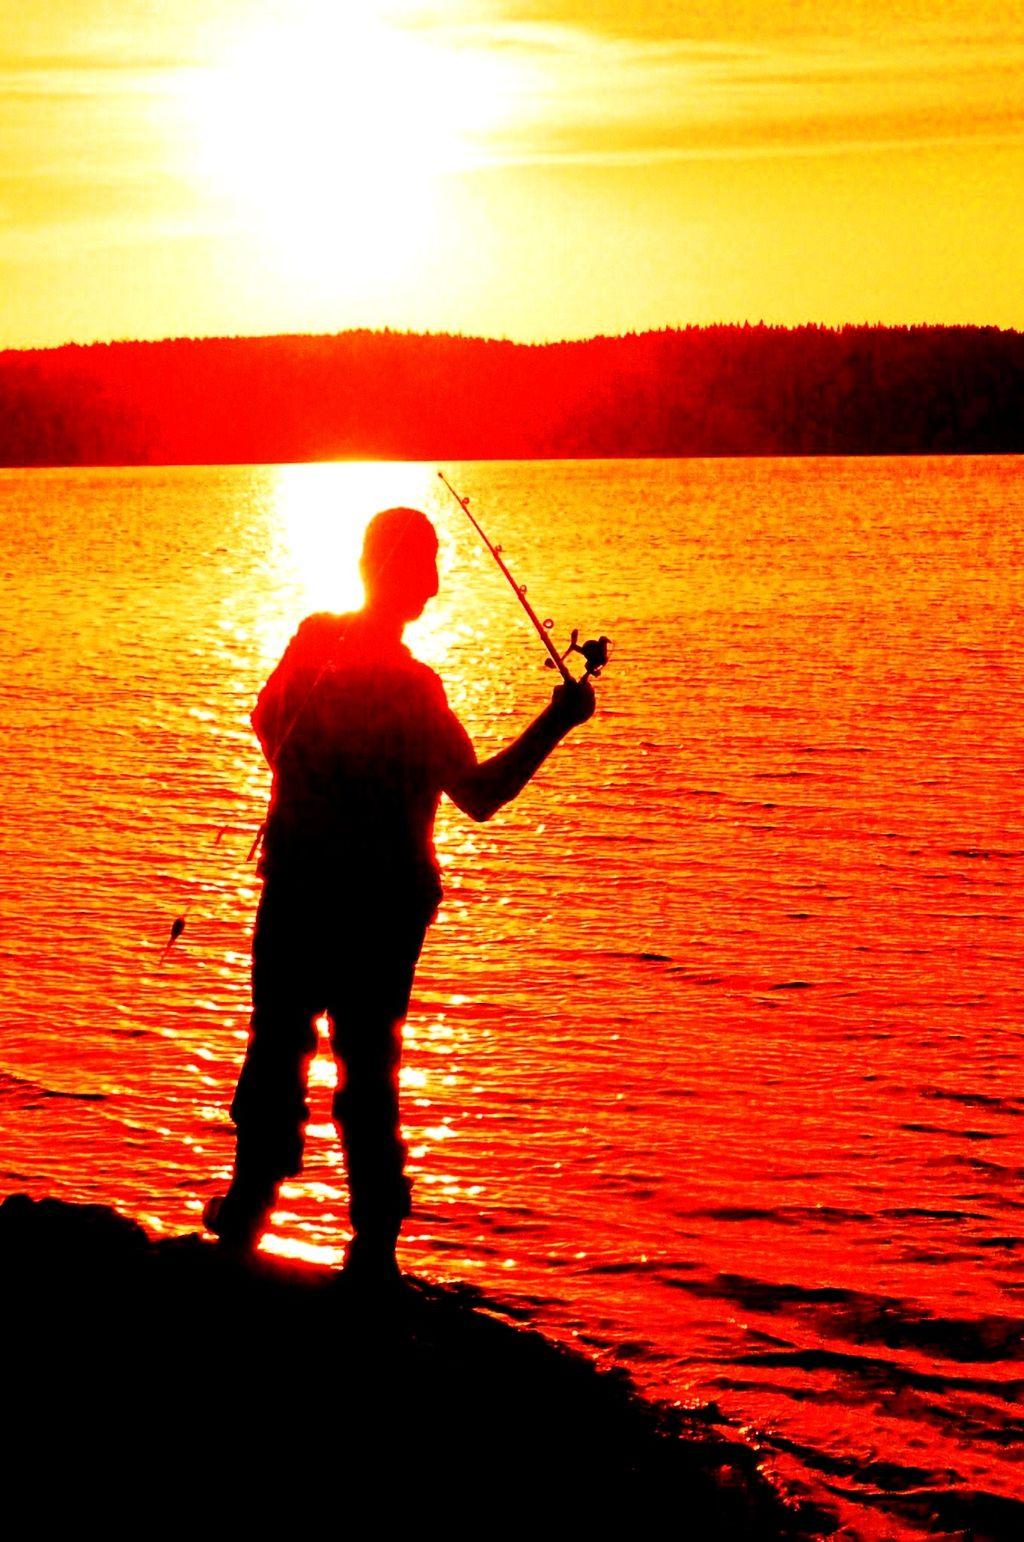 Название: рыбалка на закате.JPG Просмотров: 247  Размер: 253.8 Кб